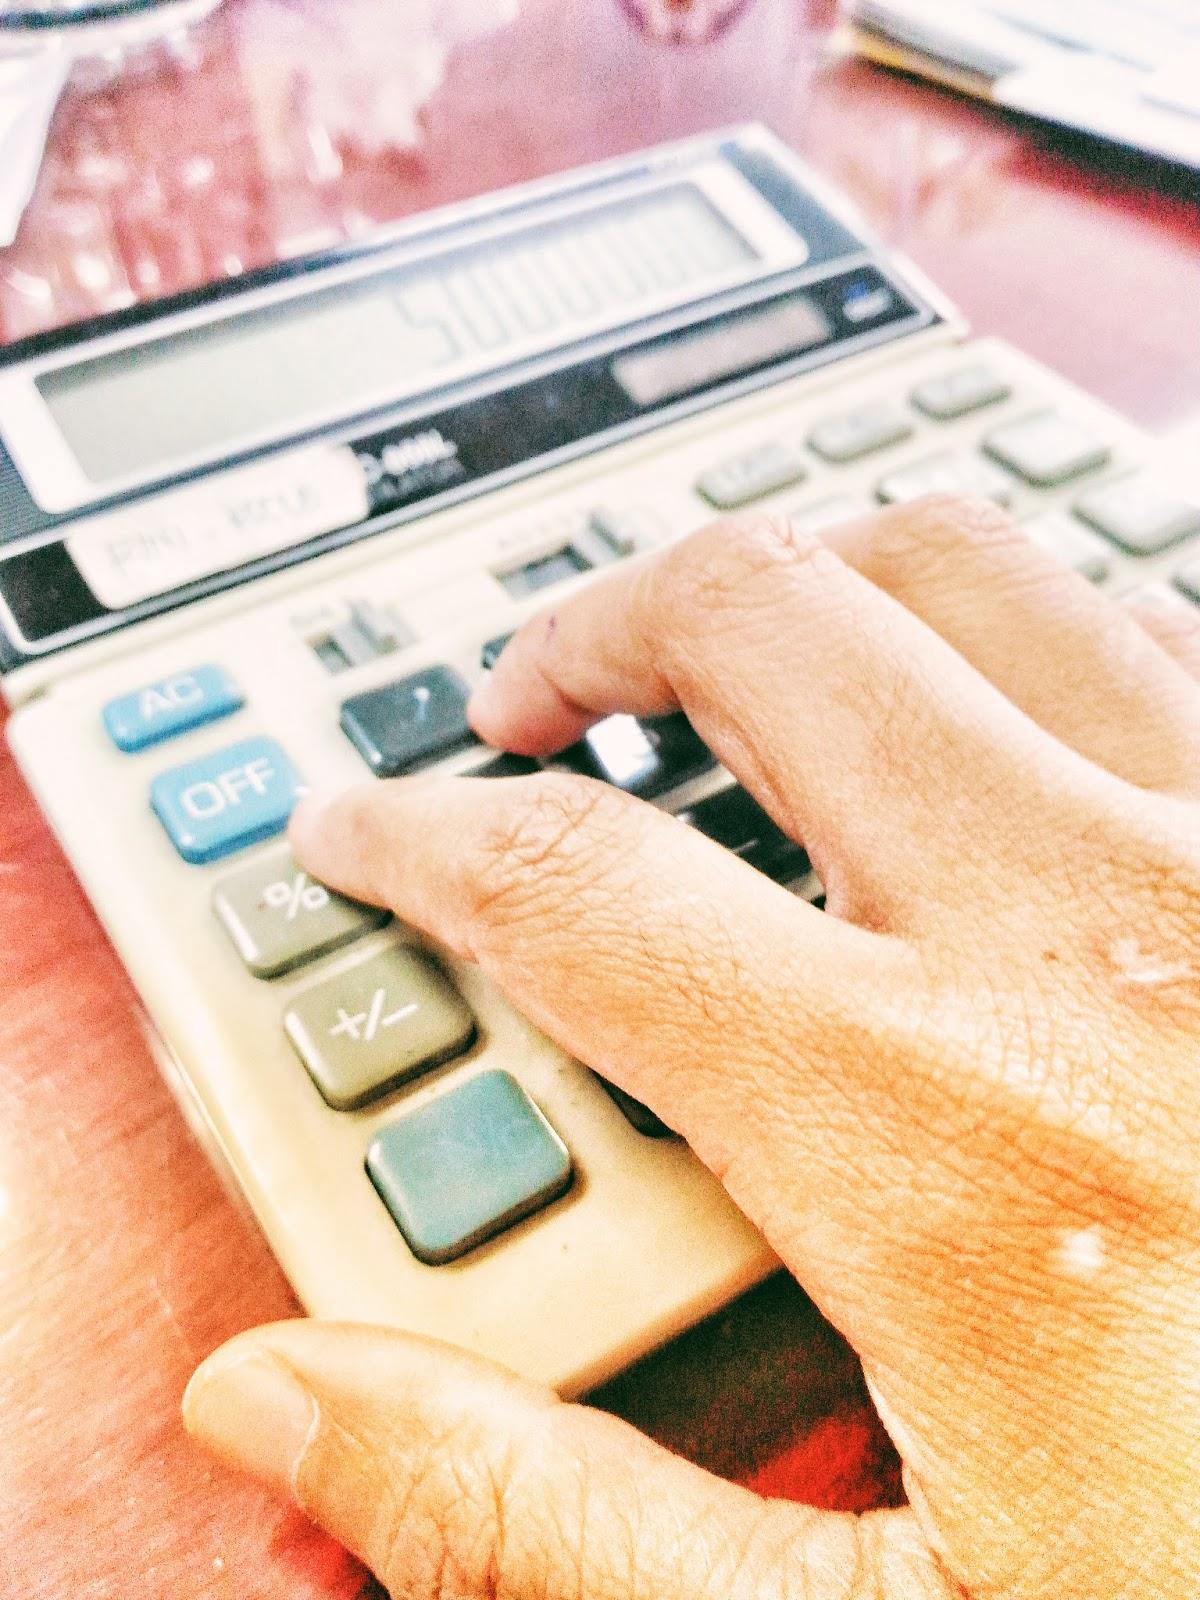 pentingnya membuat anggaran dan mencatat keuangan